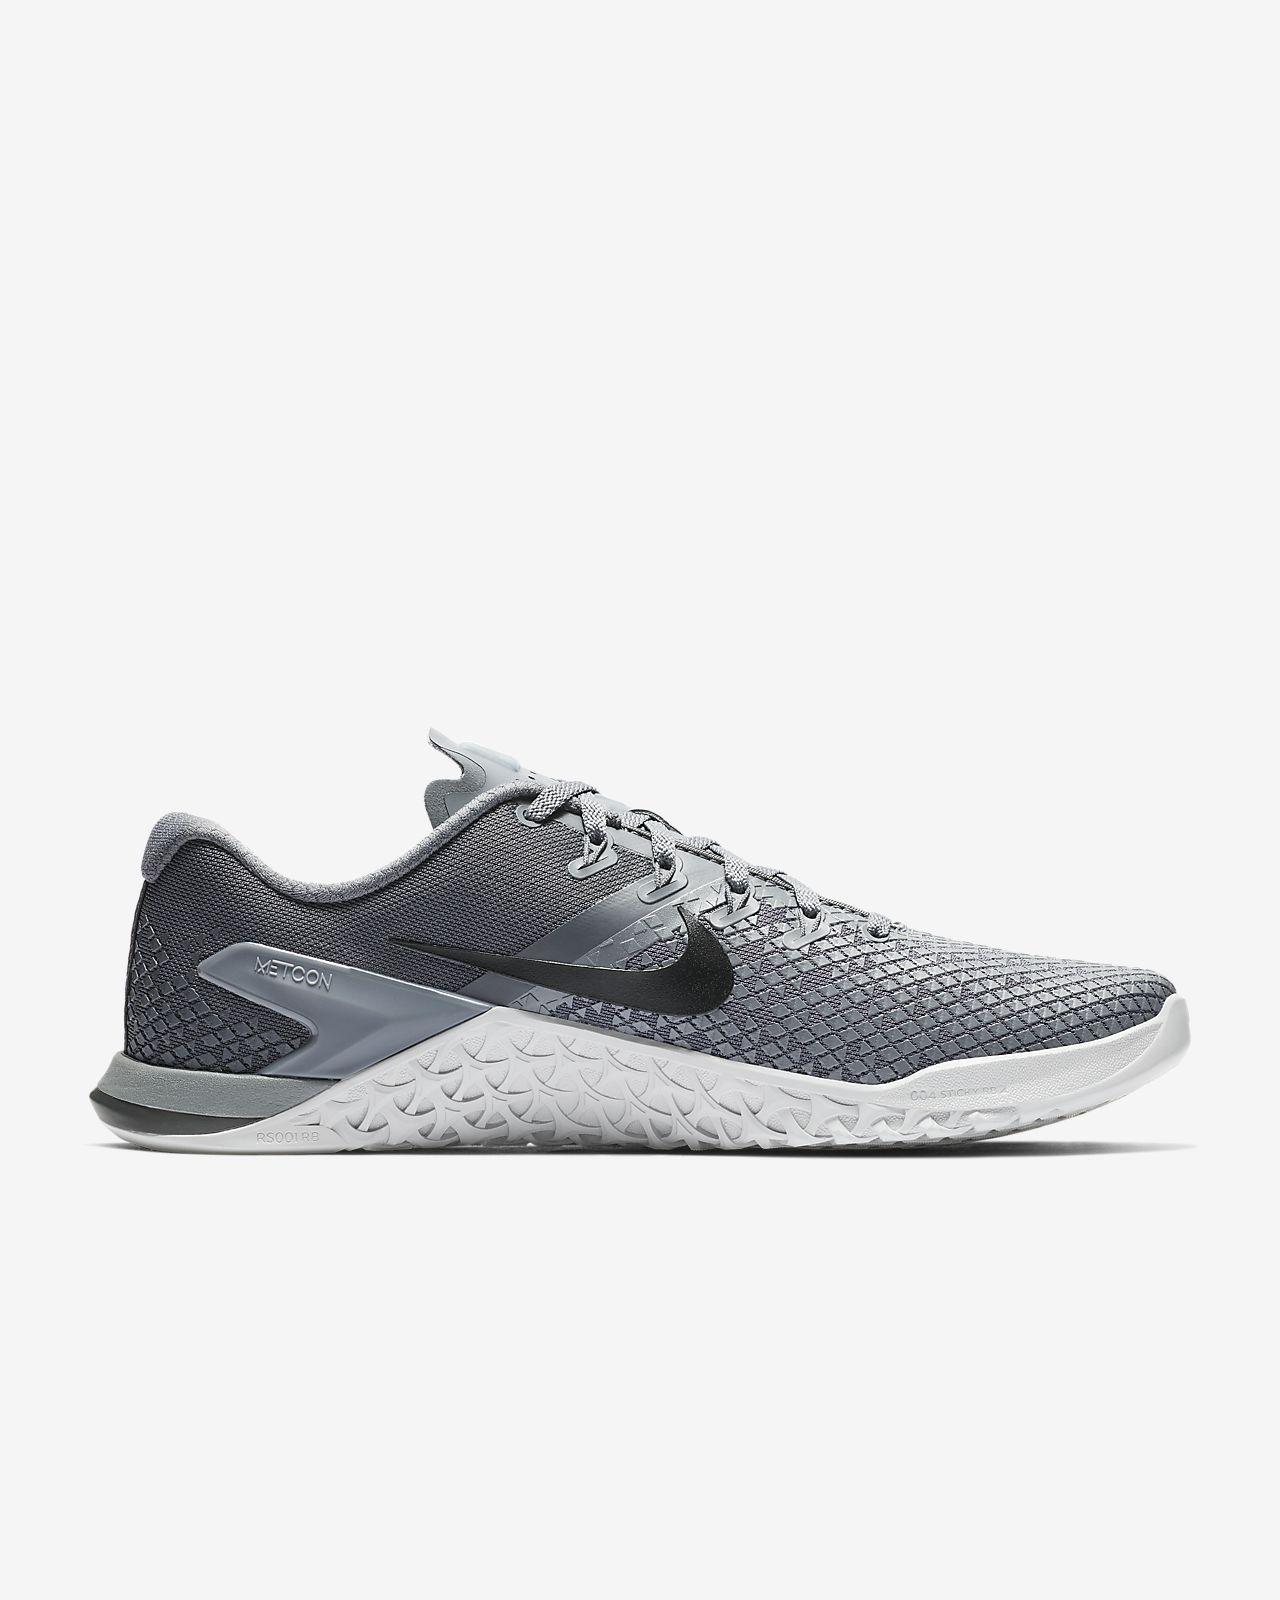 276d234075 Nike Metcon 4 XD Men s Training Shoe. Nike.com CZ